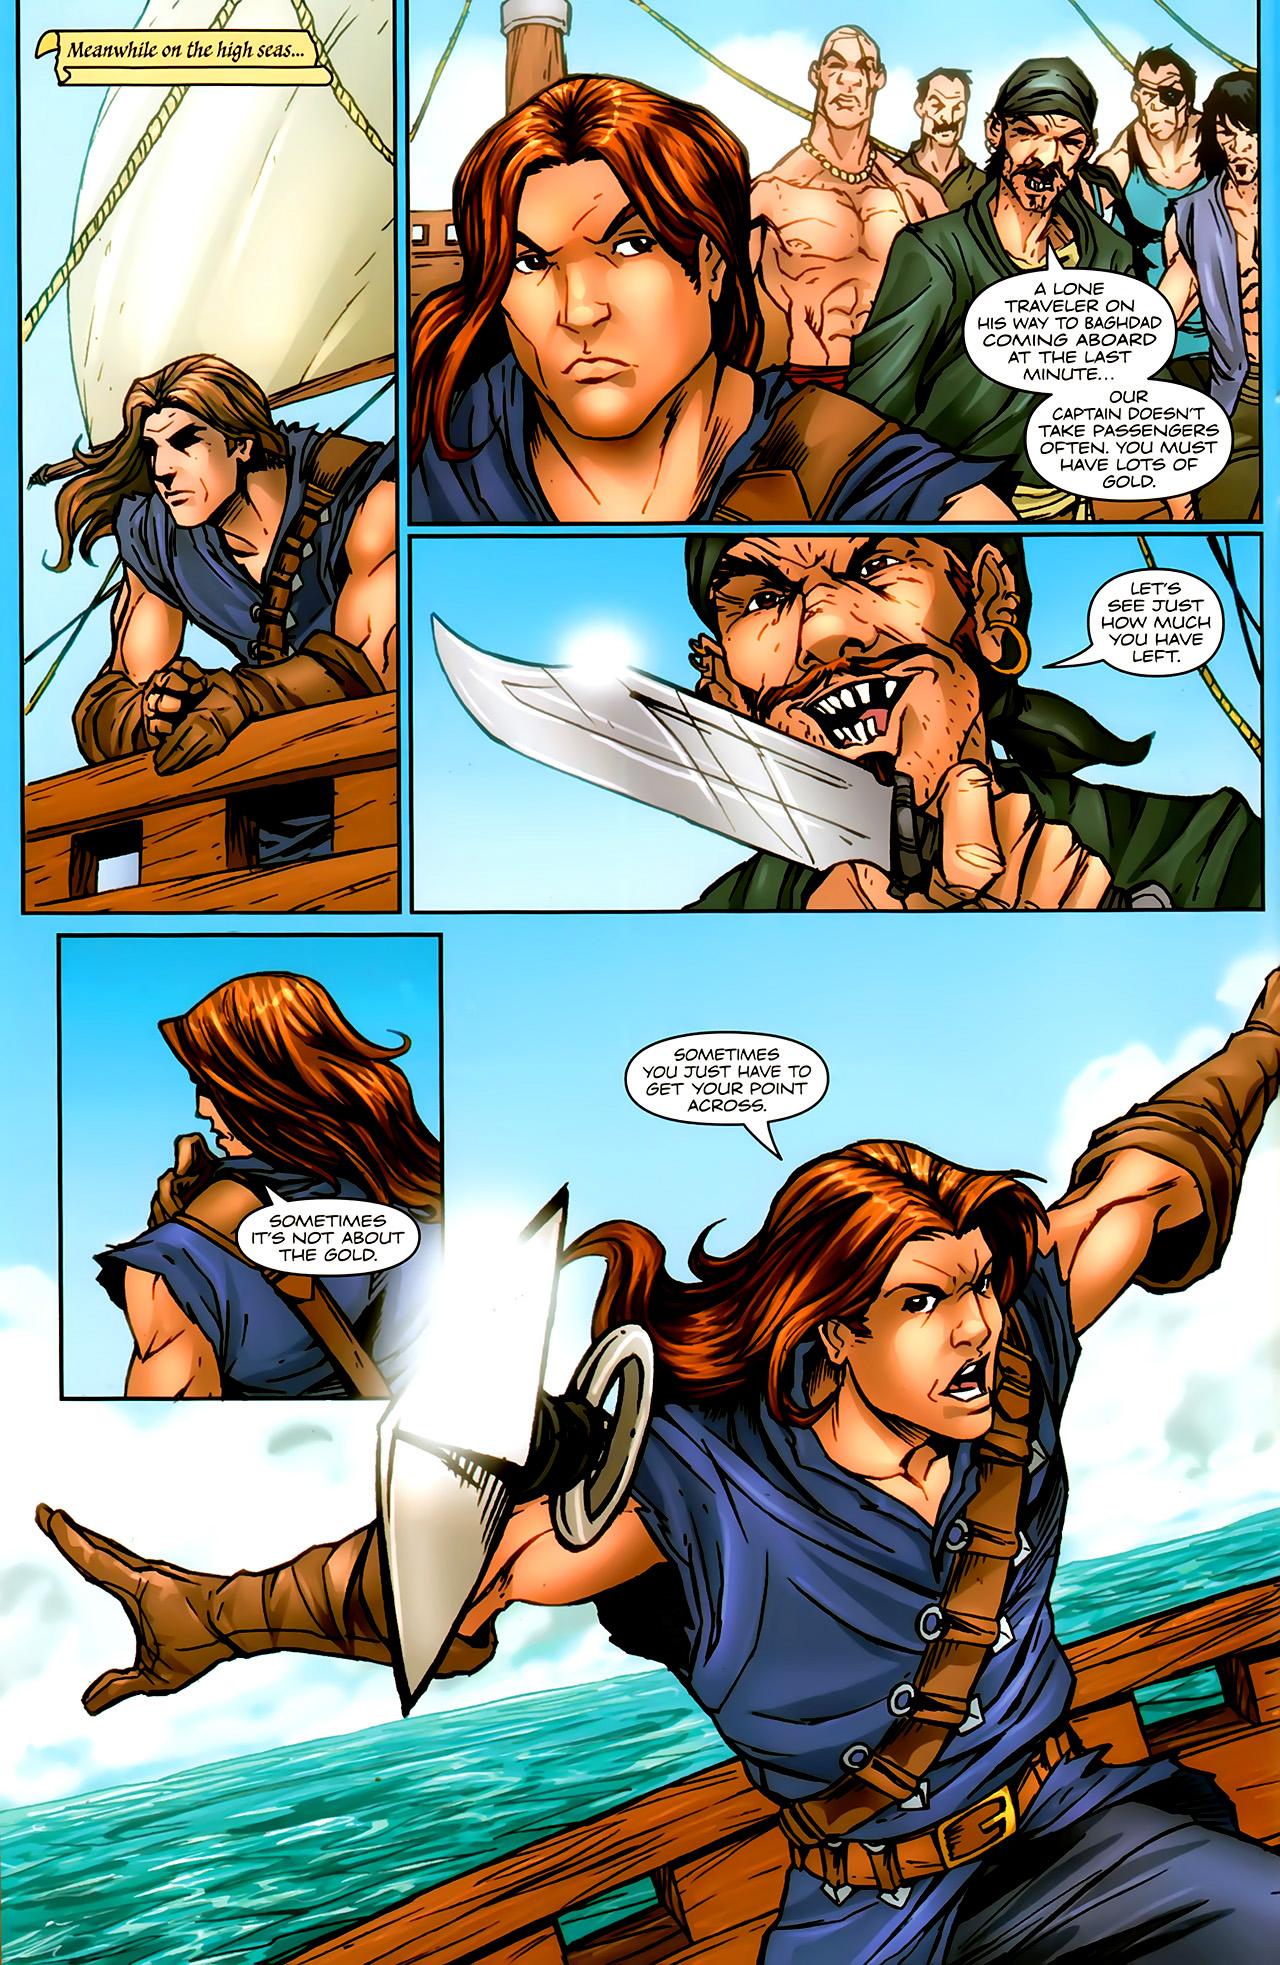 Read online 1001 Arabian Nights: The Adventures of Sinbad comic -  Issue #9 - 10